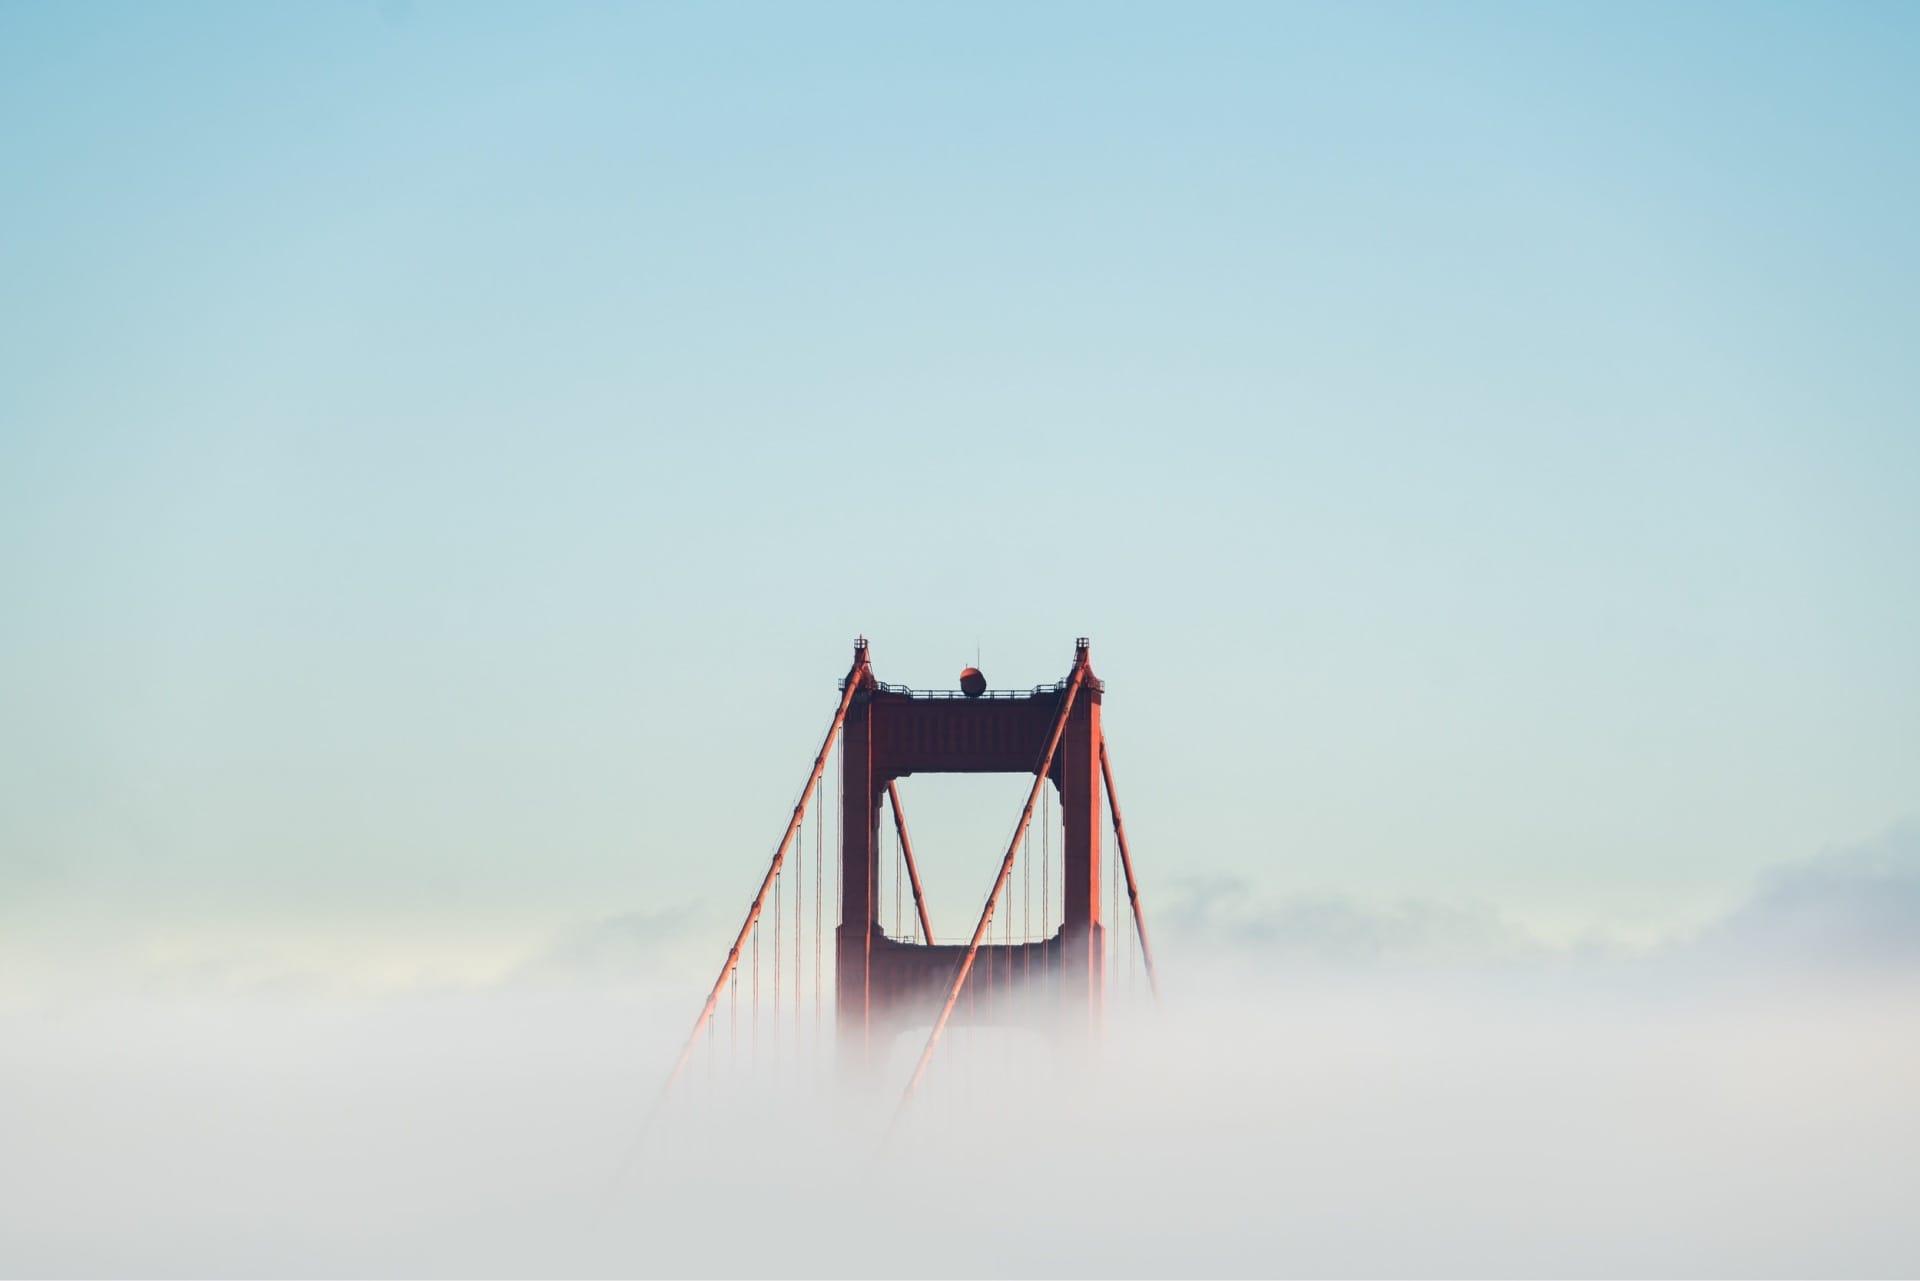 Golden gate bridge through the clouds